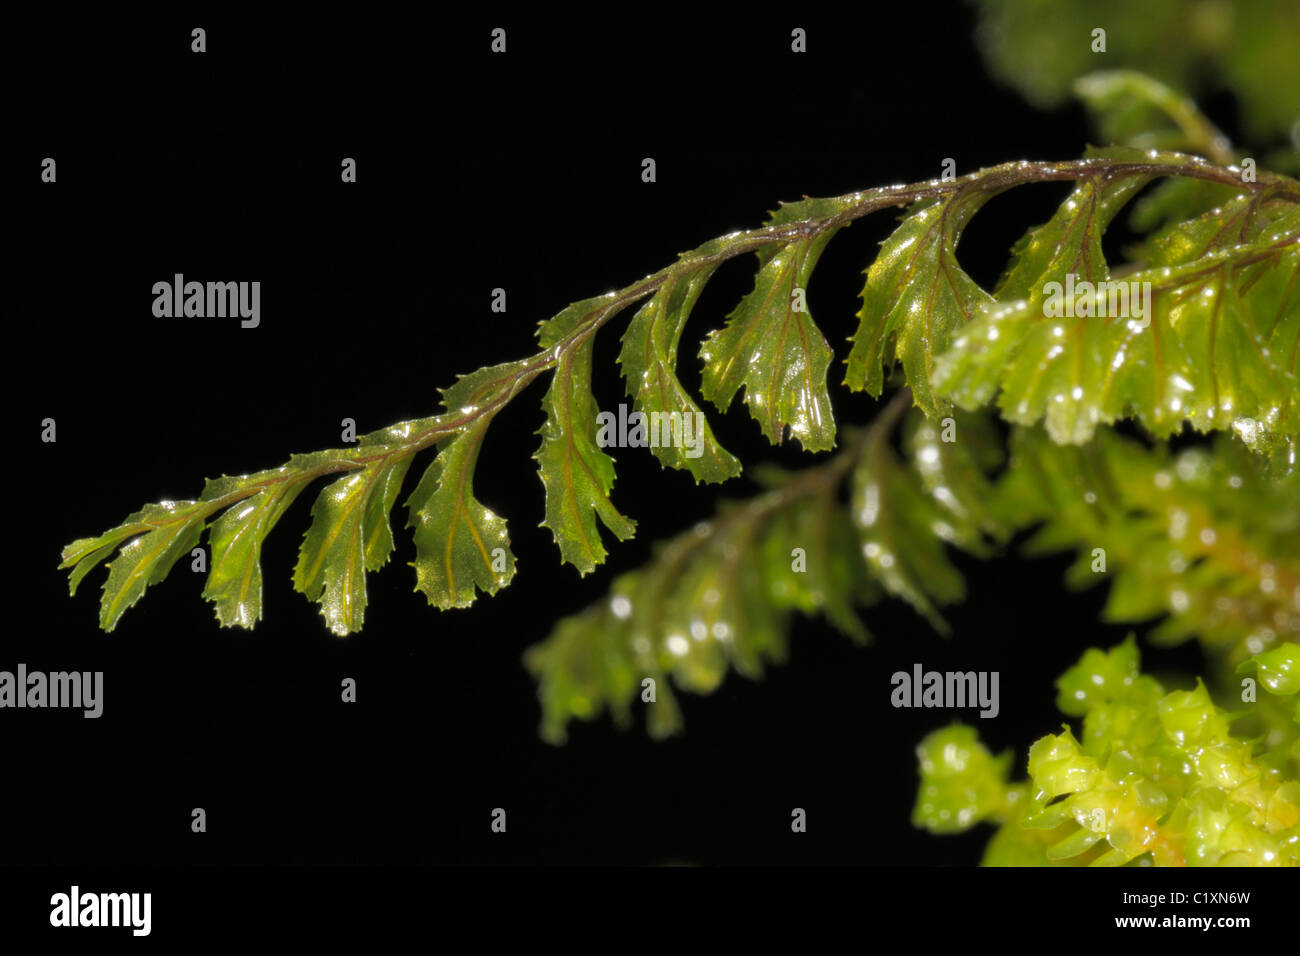 Wilson's Filmy-fern, hymenophyllum wilsonii - Stock Image